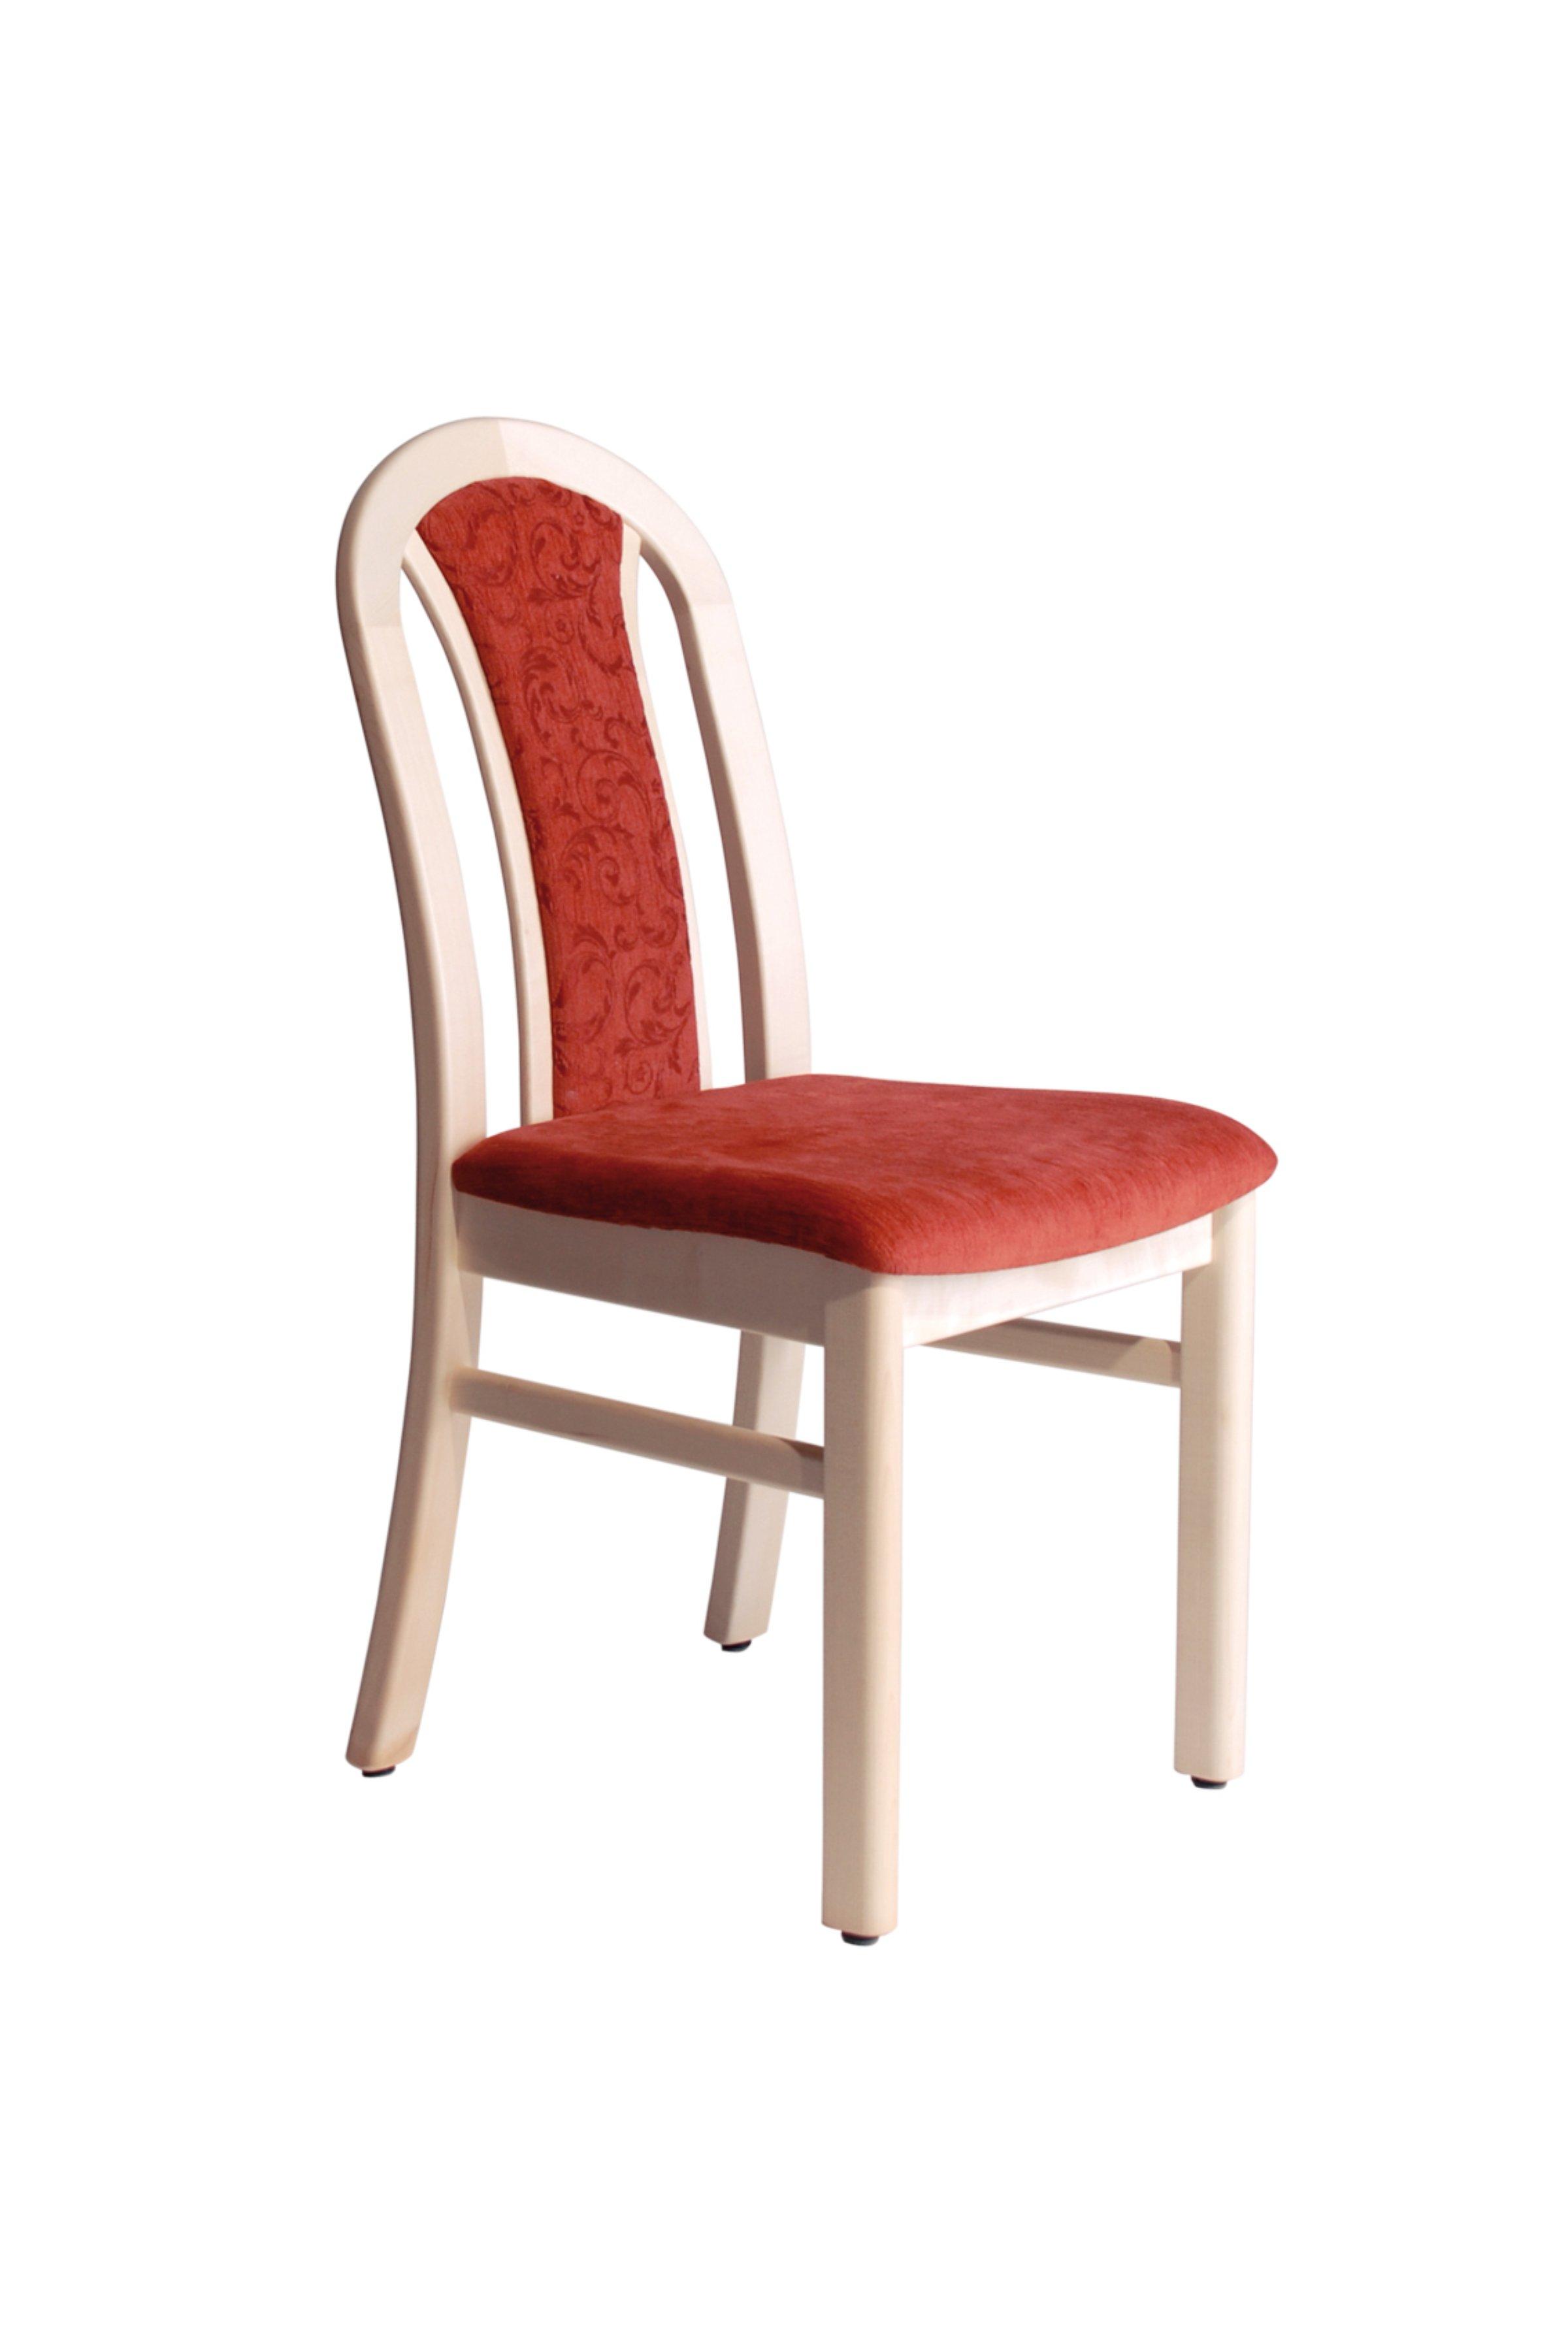 hometex th ni st hle und tische. Black Bedroom Furniture Sets. Home Design Ideas